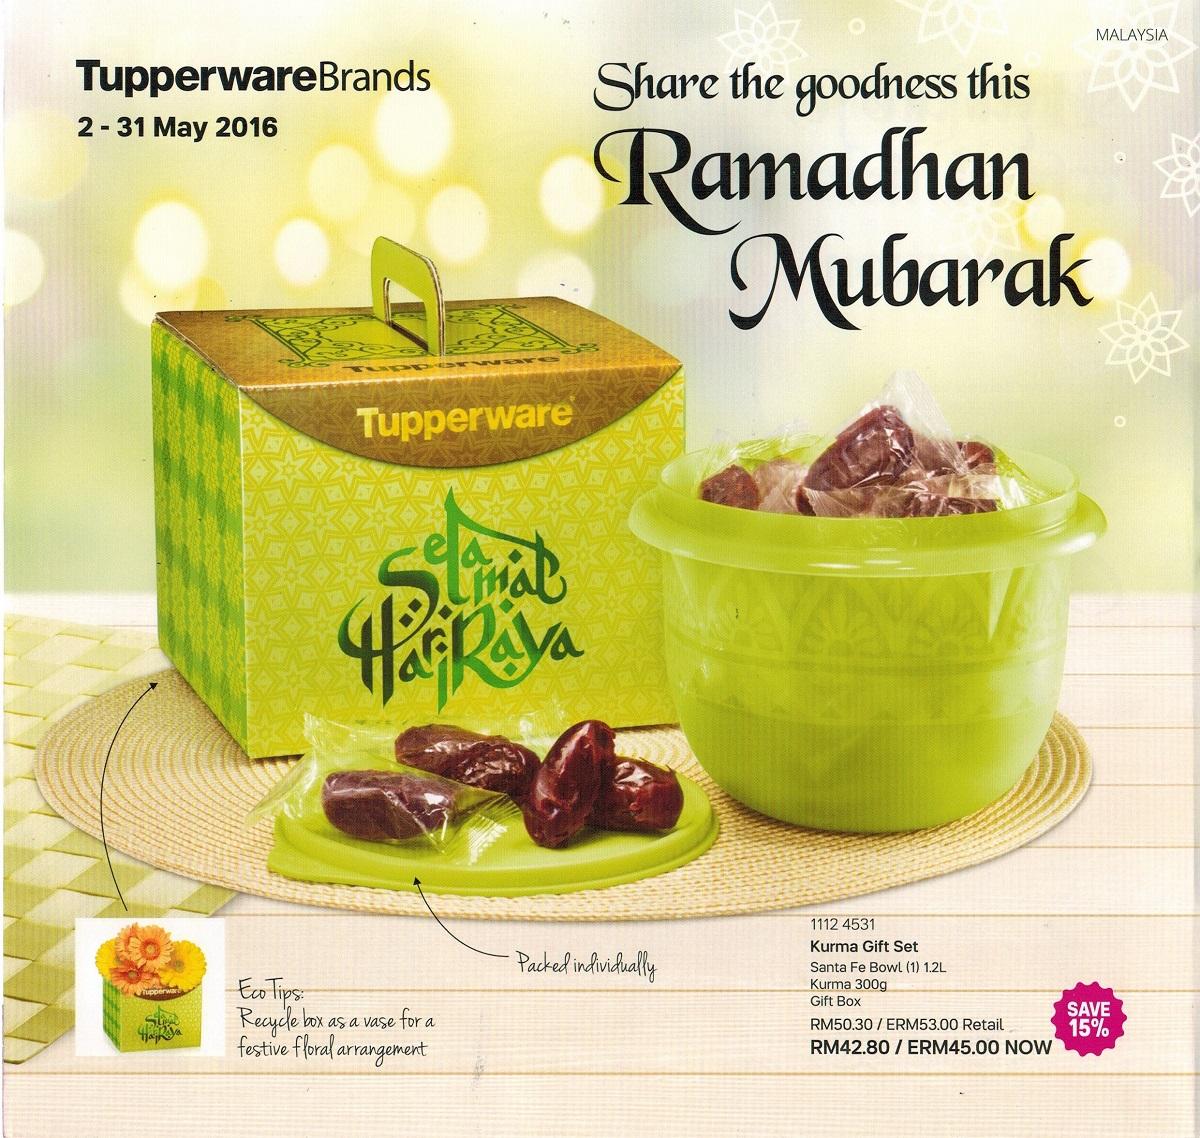 Cerita Ramadhan Saya Leaflet Tupperware Malaysia 2 May 31 May 2016